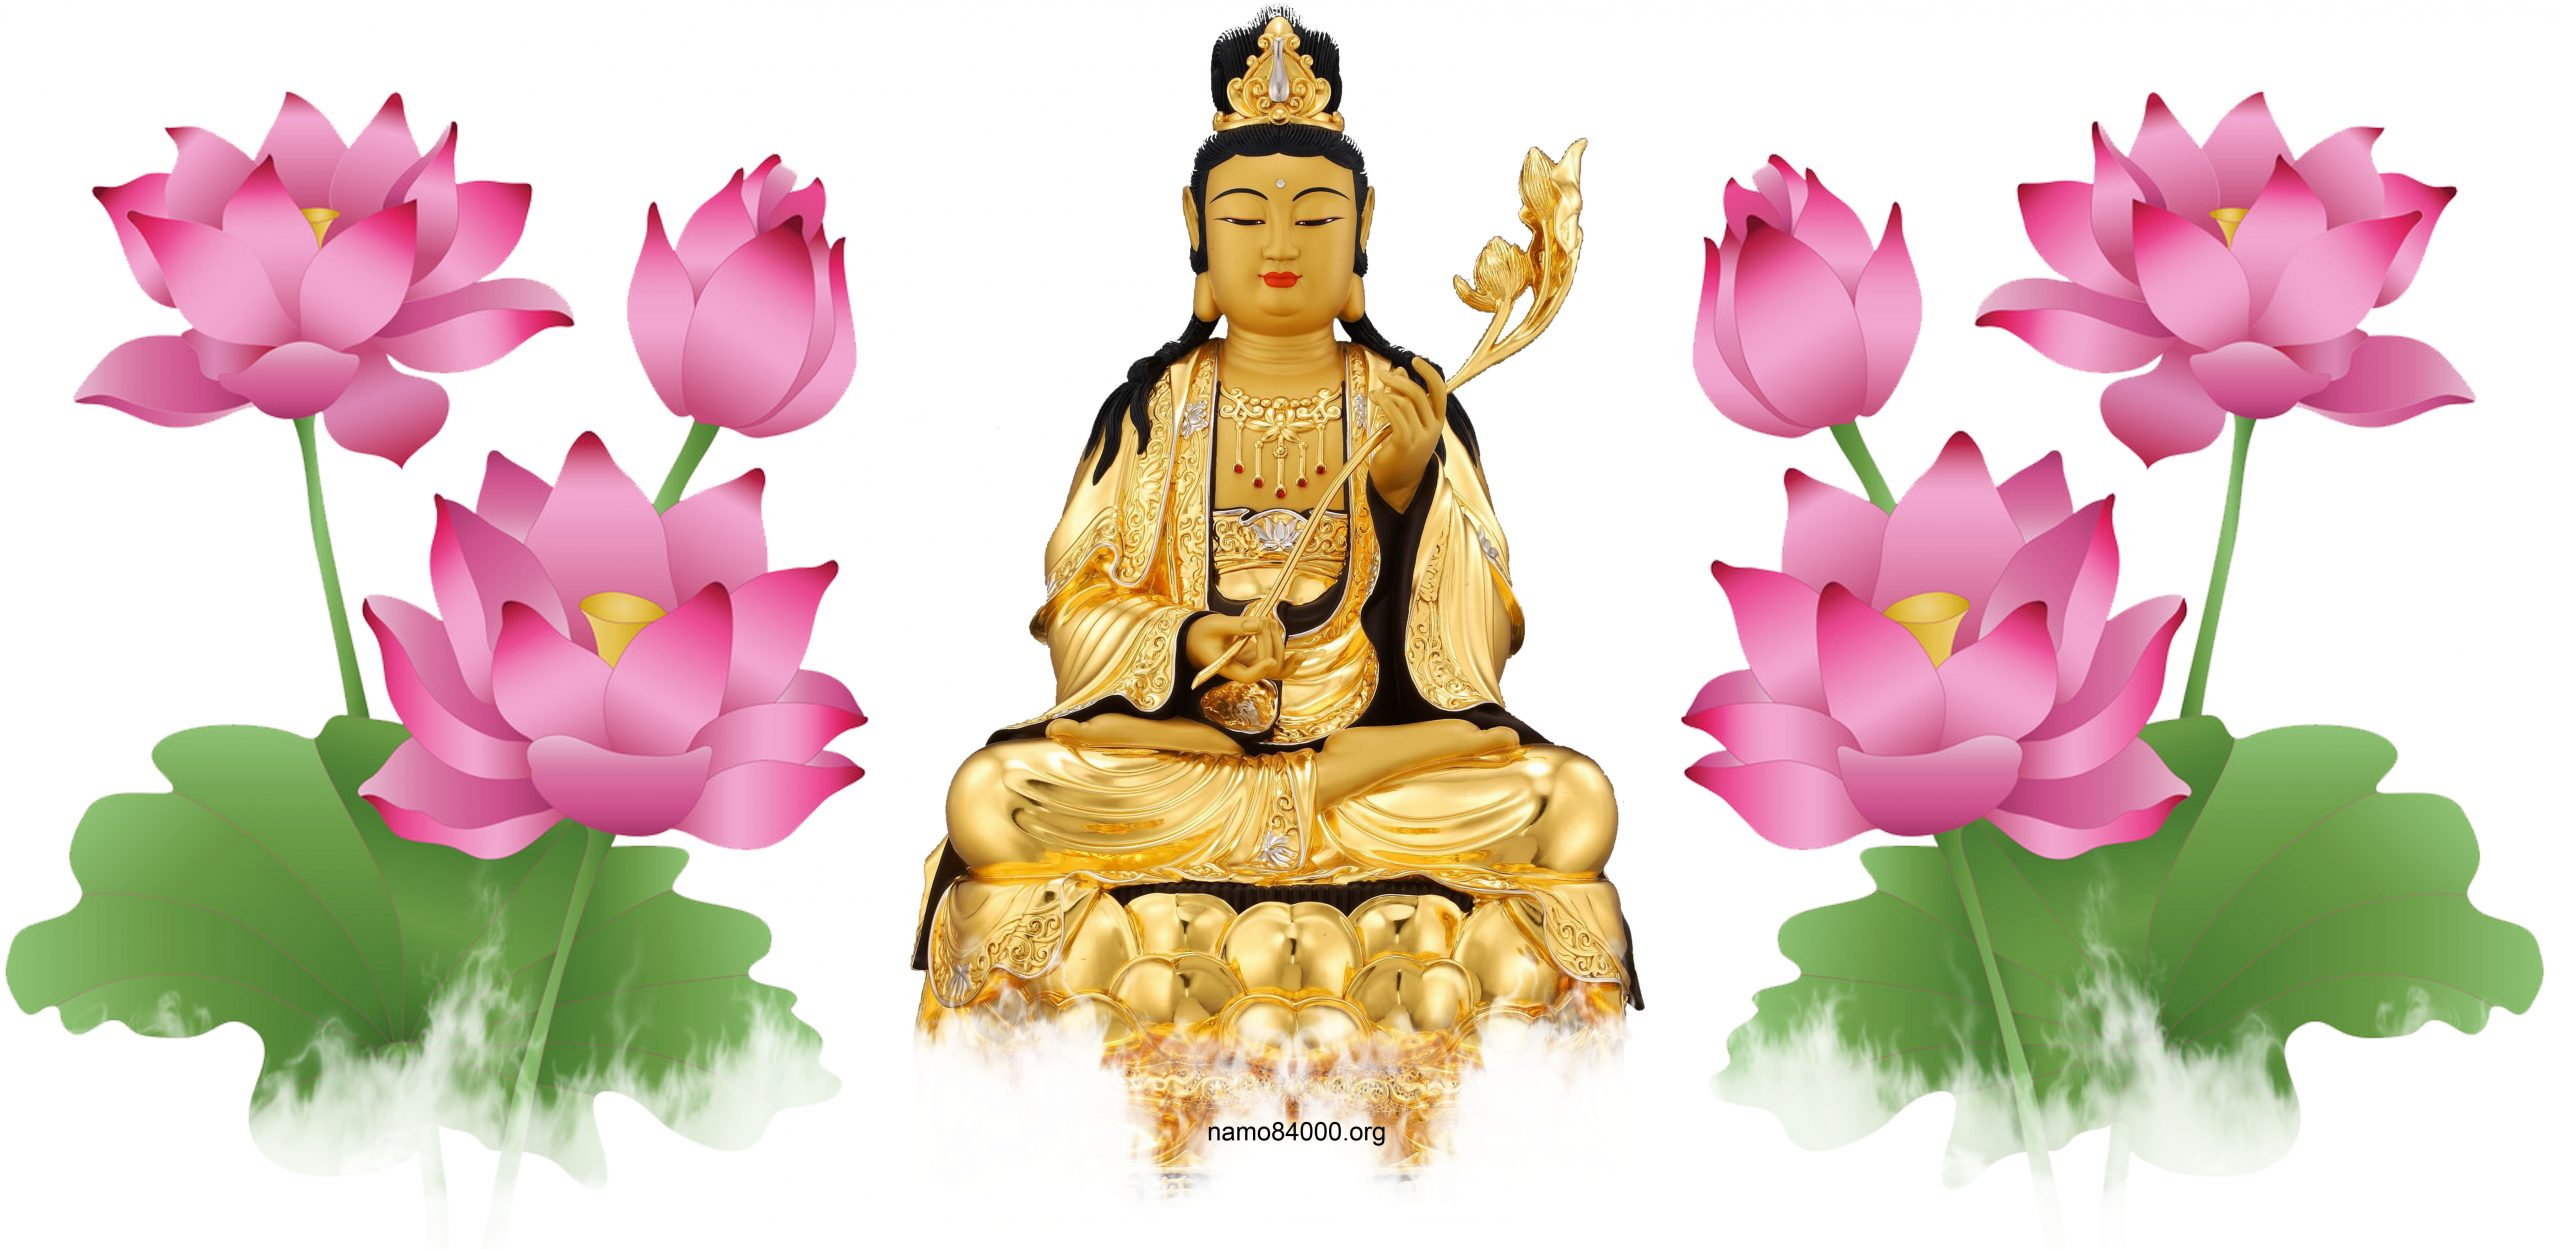 Đại Thế Chí Bồ tát – Mahāsthāmaprāpta Bodhisattva – 大勢至菩薩